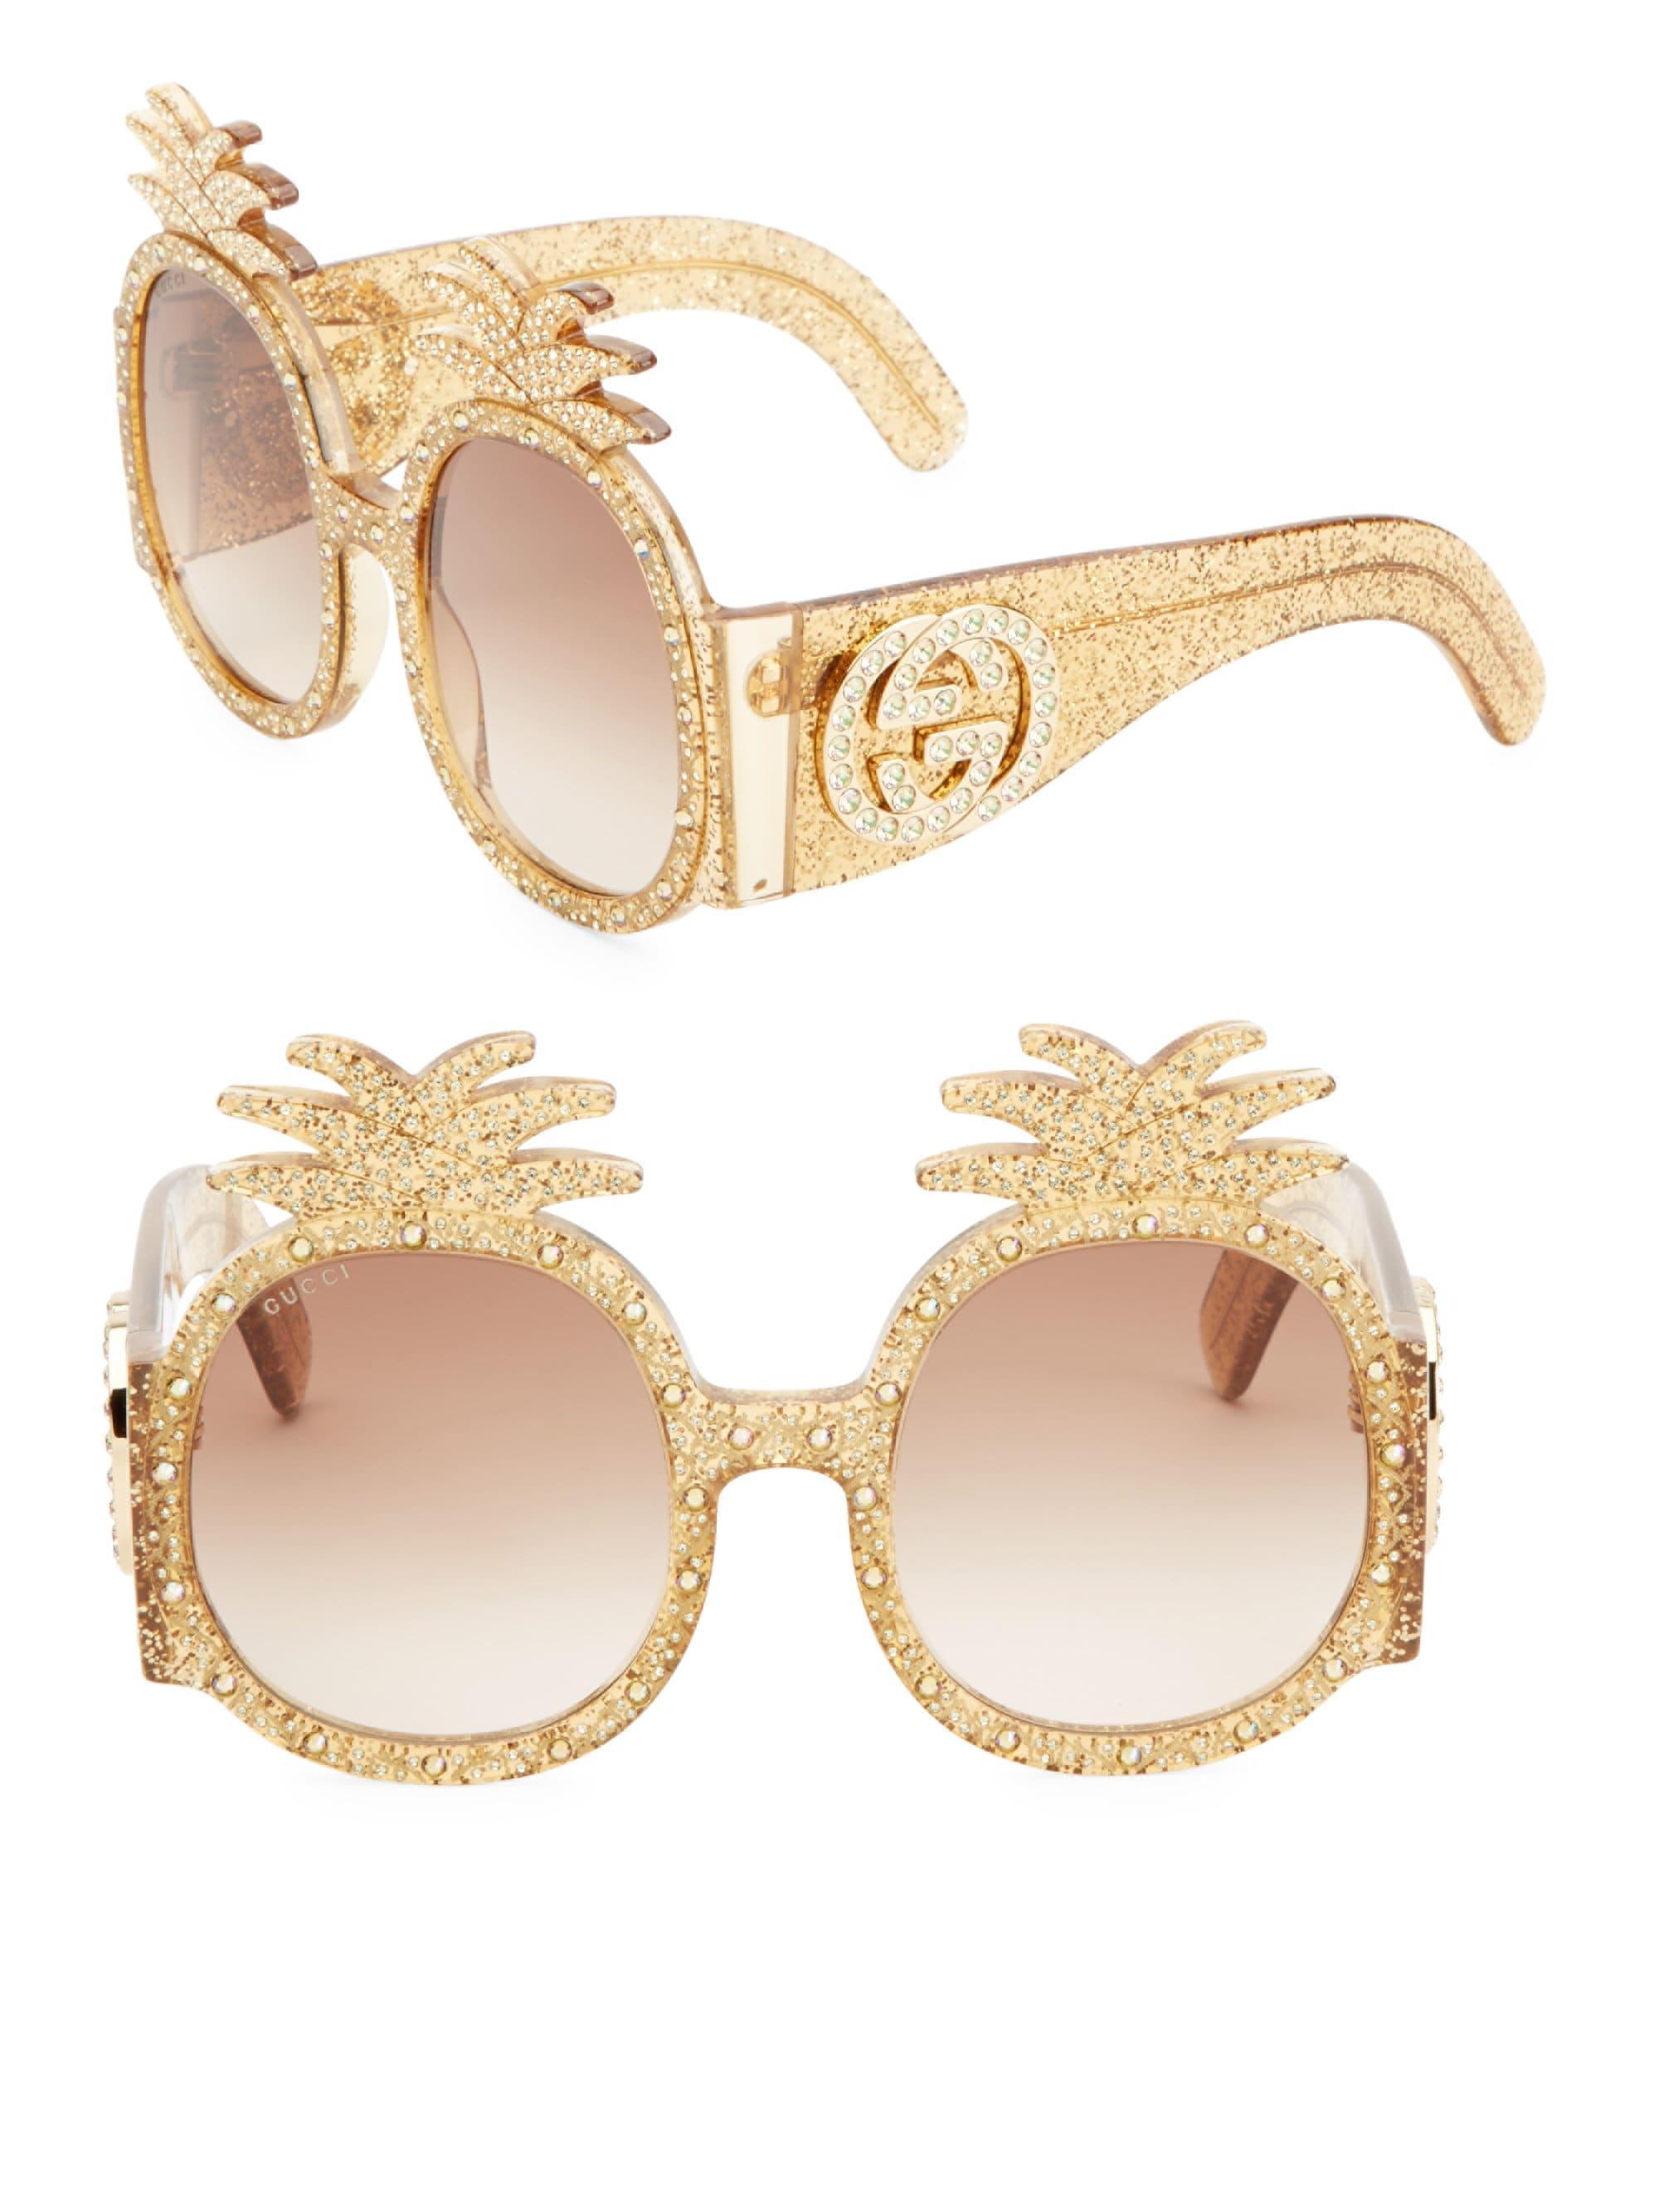 eb56d19c63f Lyst - Gucci Women s 53mm Pineapple Sunglasses - Gold in Metallic